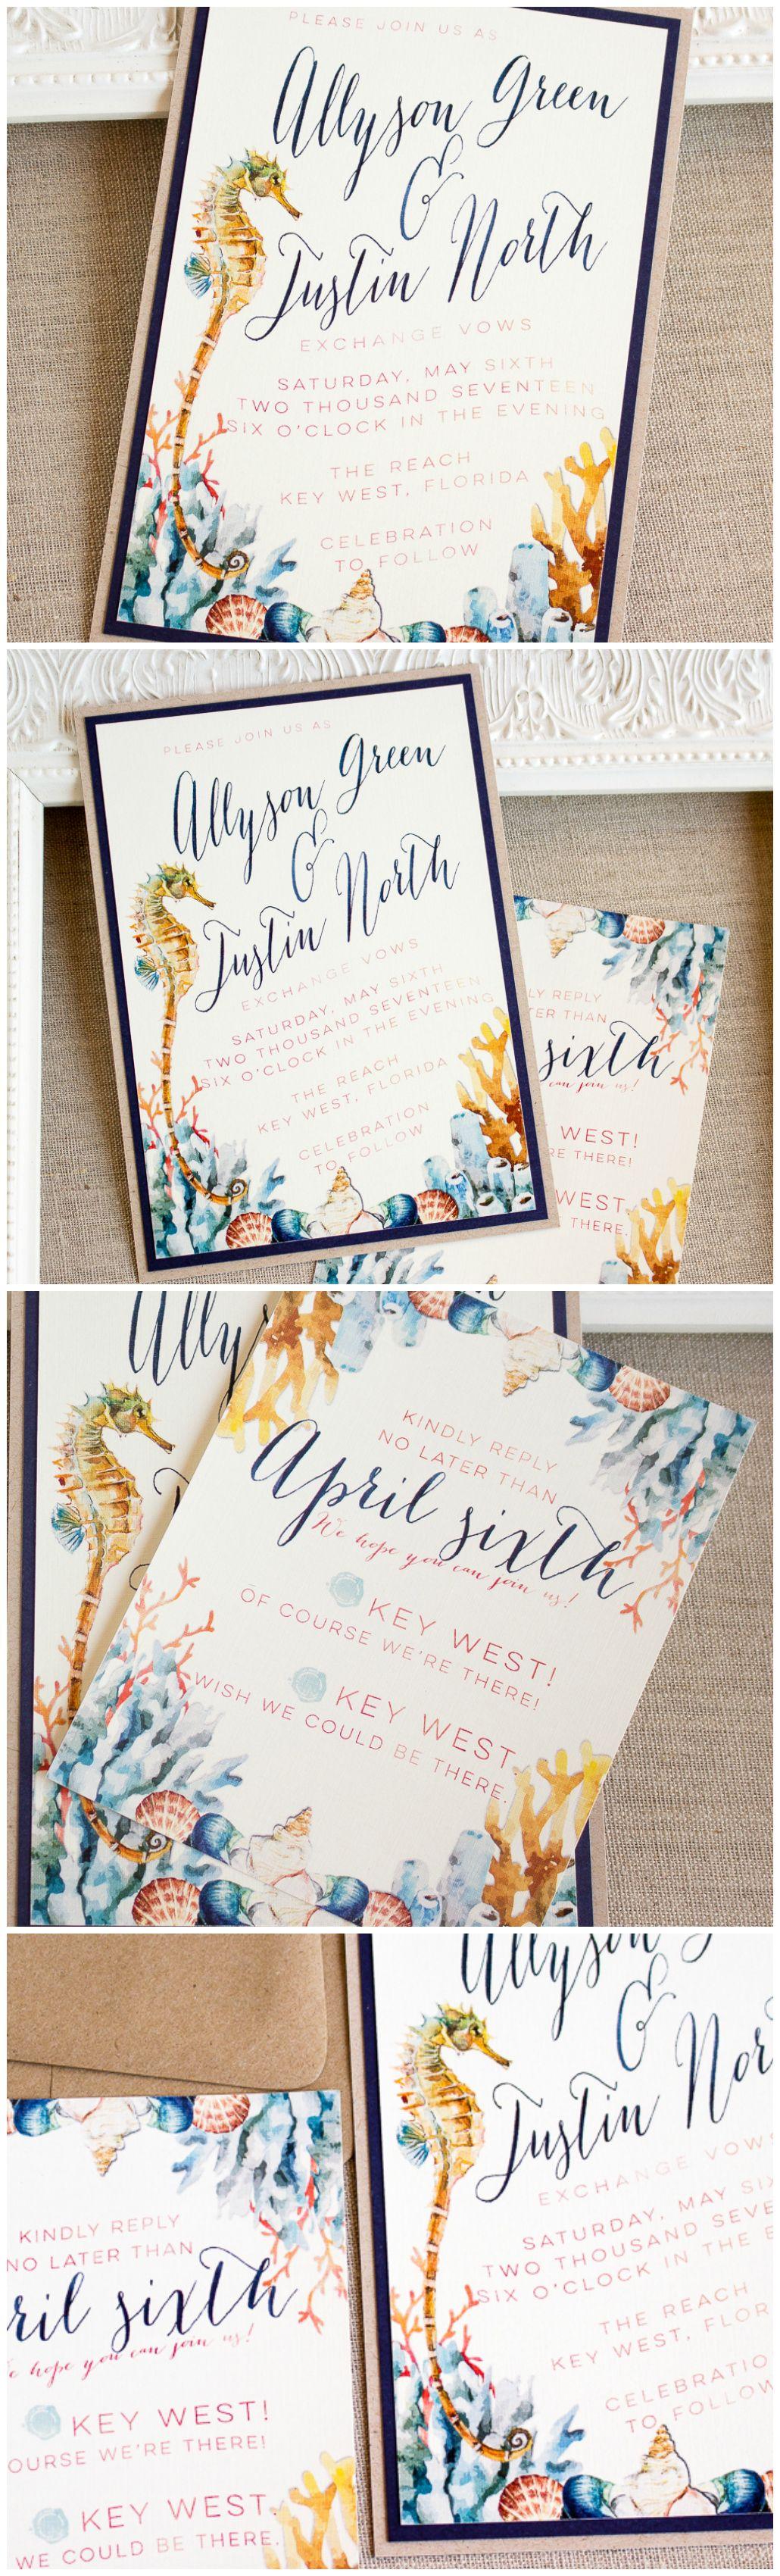 Seahorse Wedding Invitation | The Wedding Pros | The Perfect Palette ...